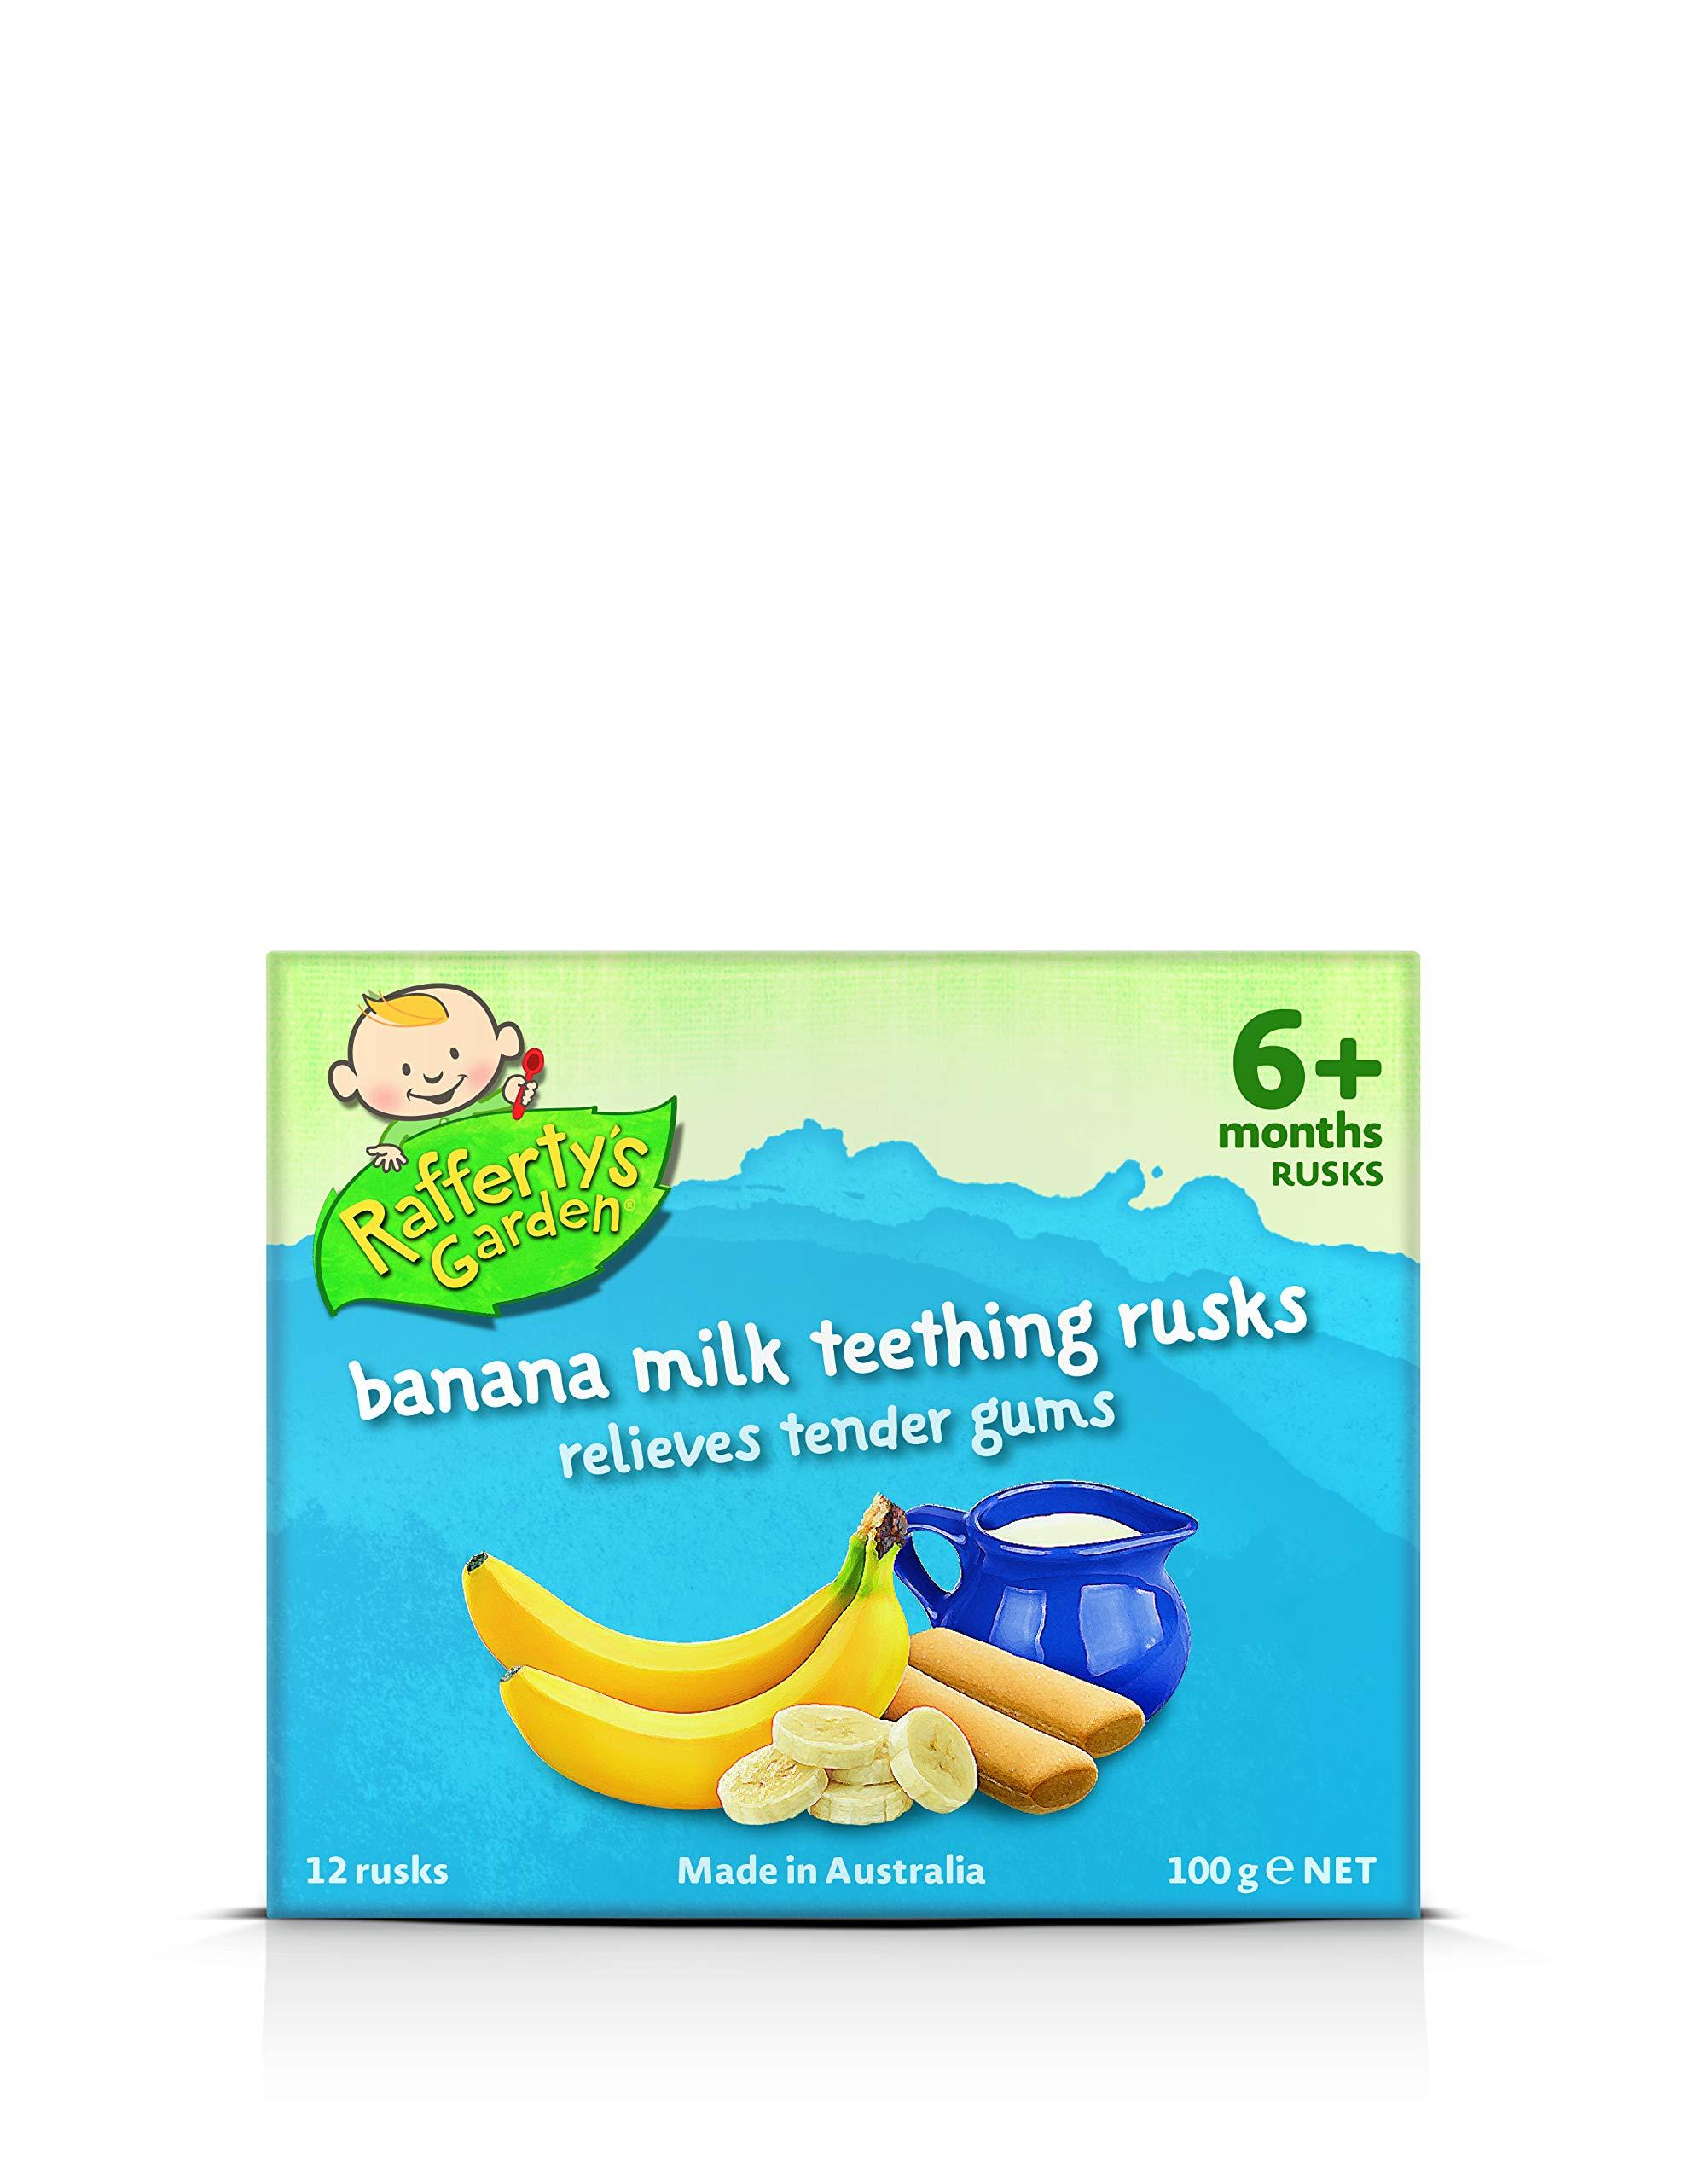 Rafferty's Garden Banana Milk Teething Rusks 100g by Rafferty's